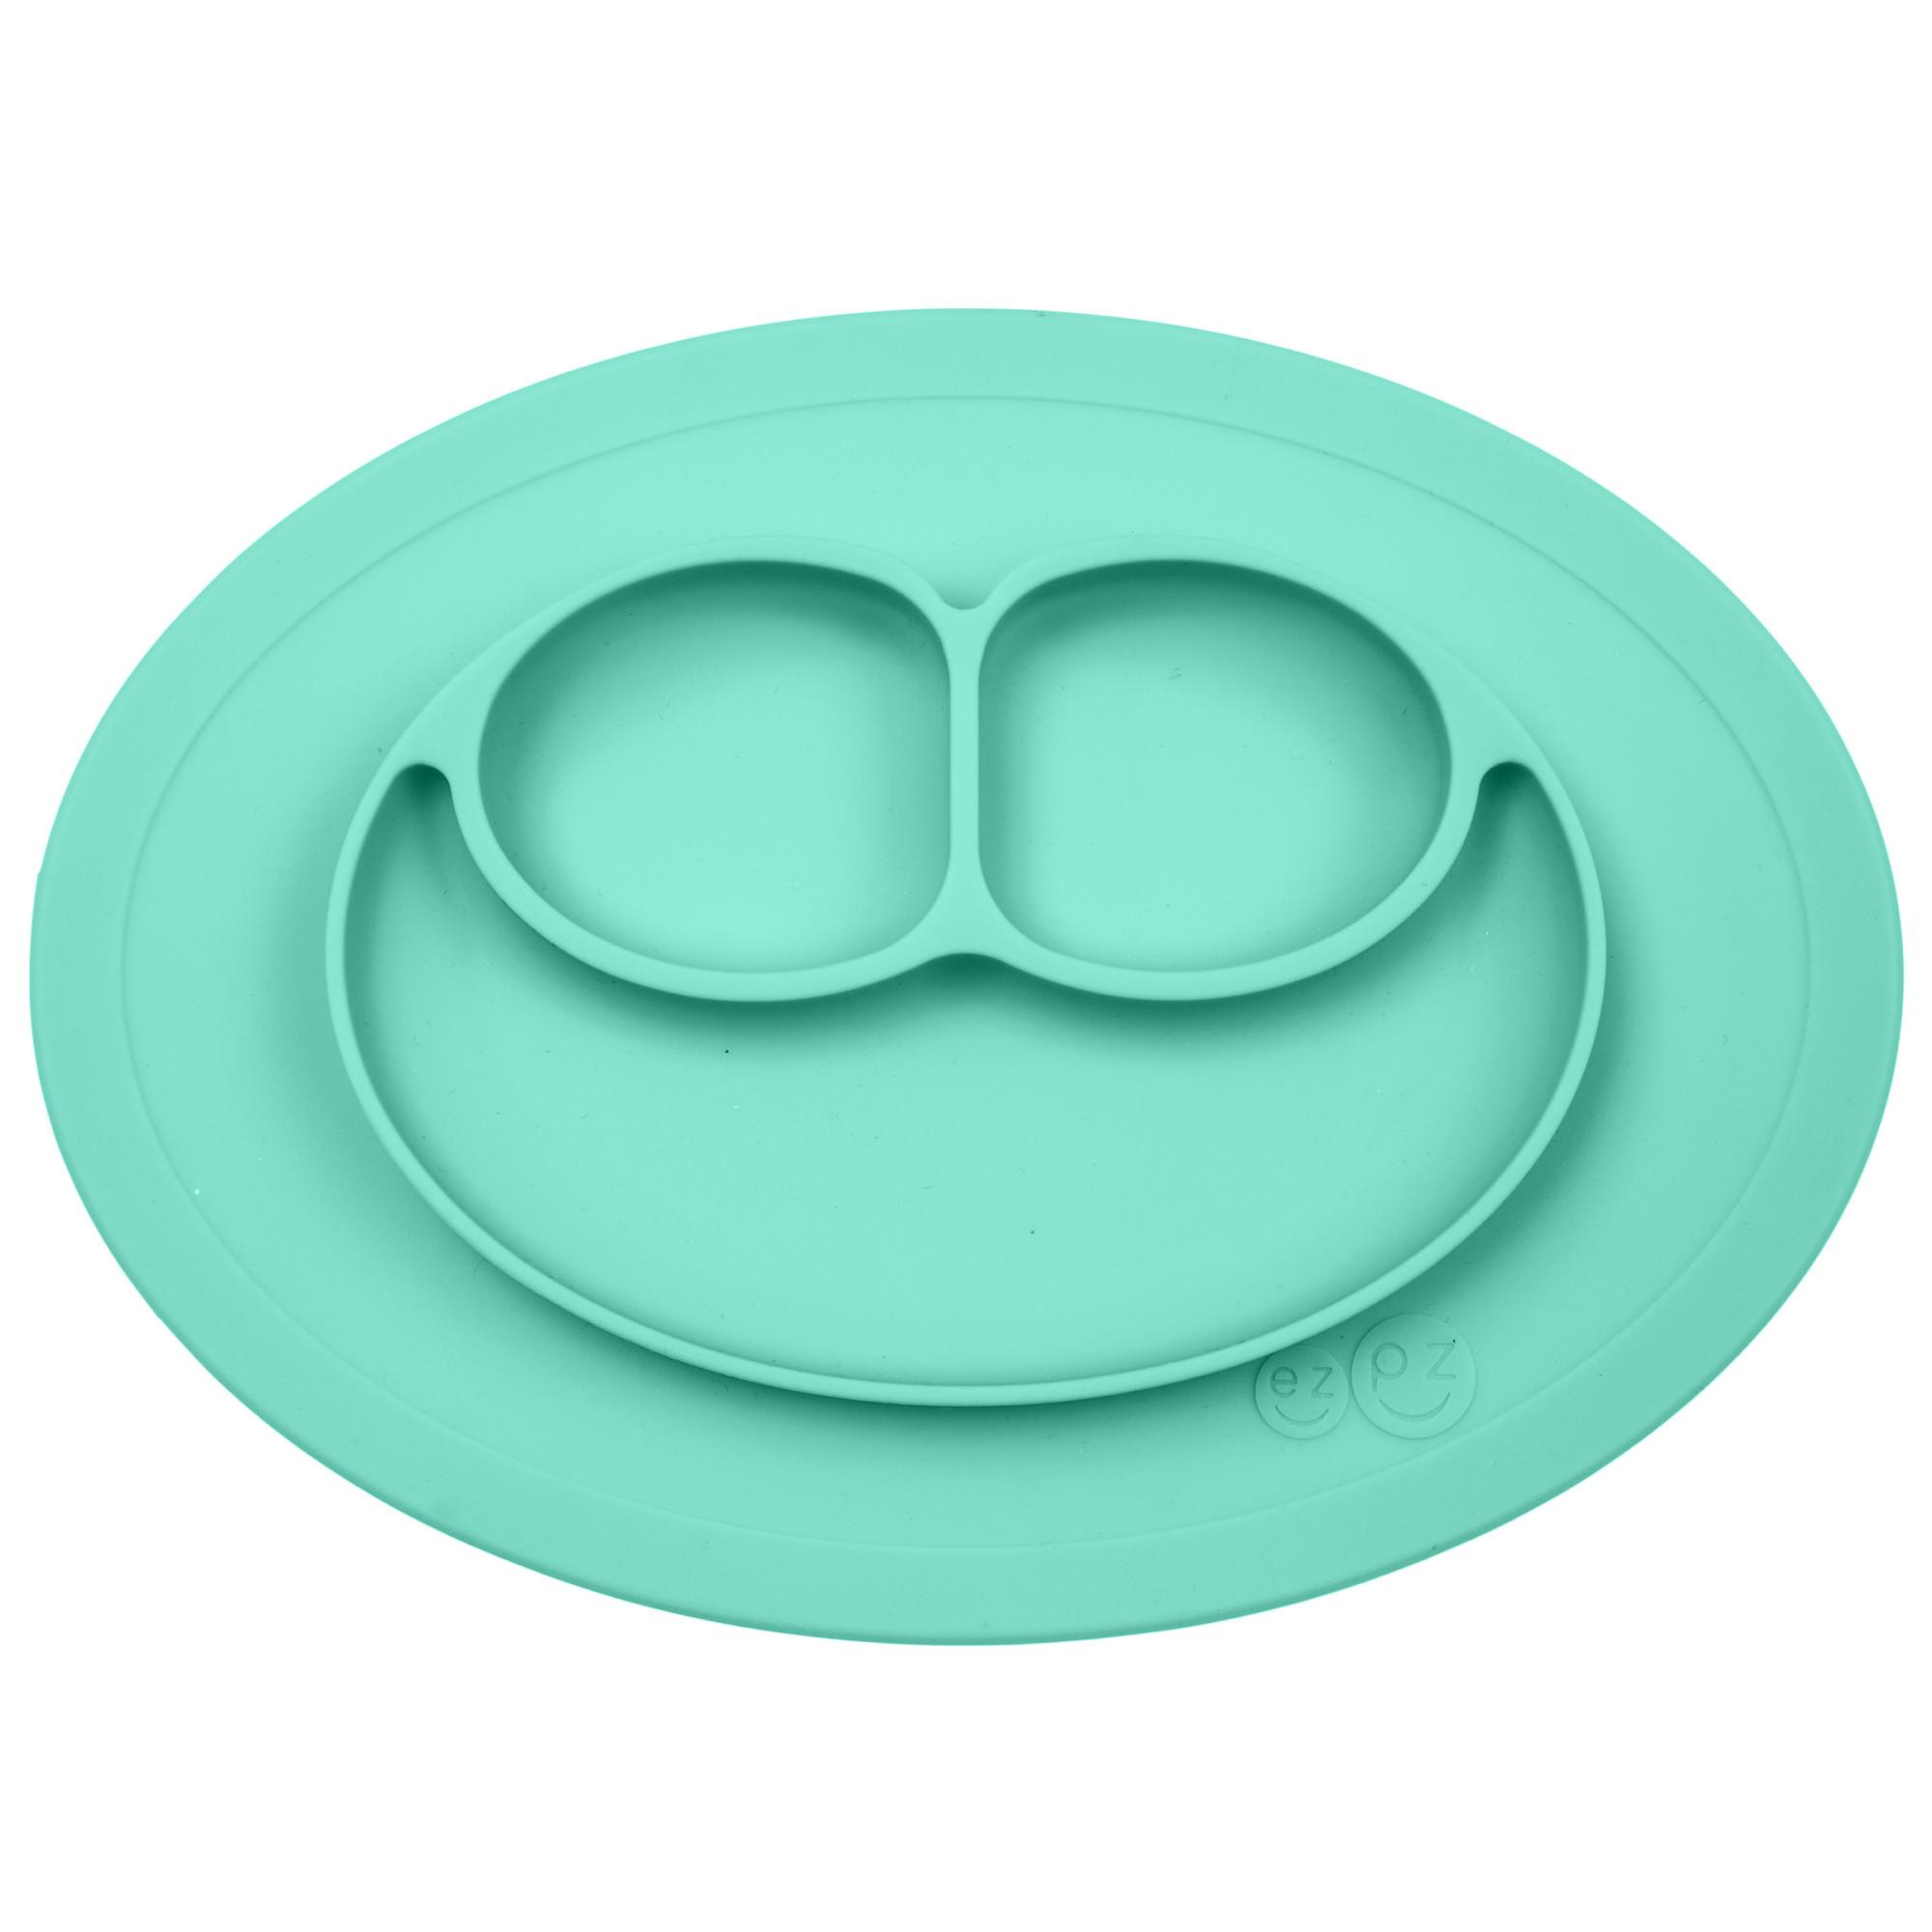 Купить Тарелка Ezpz Mini Mat, цвет аквамарин Ezpz,